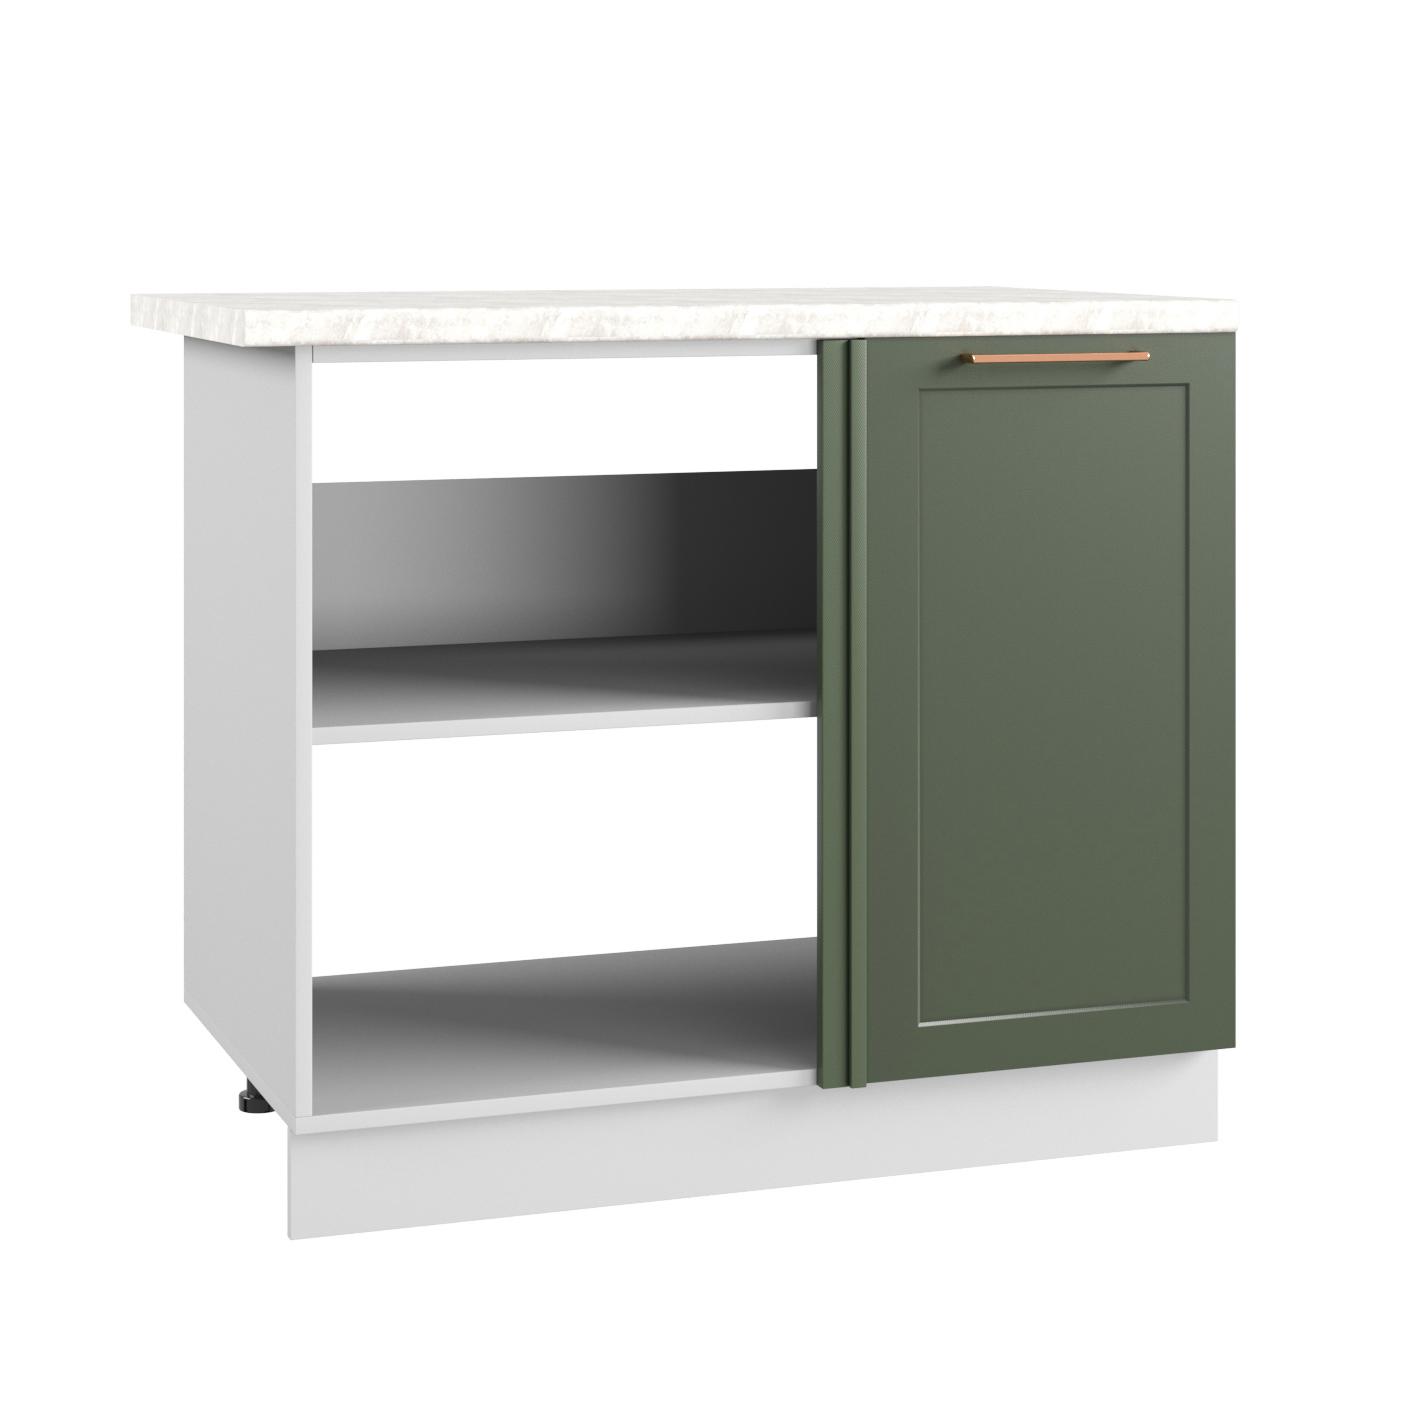 Кухня Квадро СУ 1000 Шкаф нижний угловой